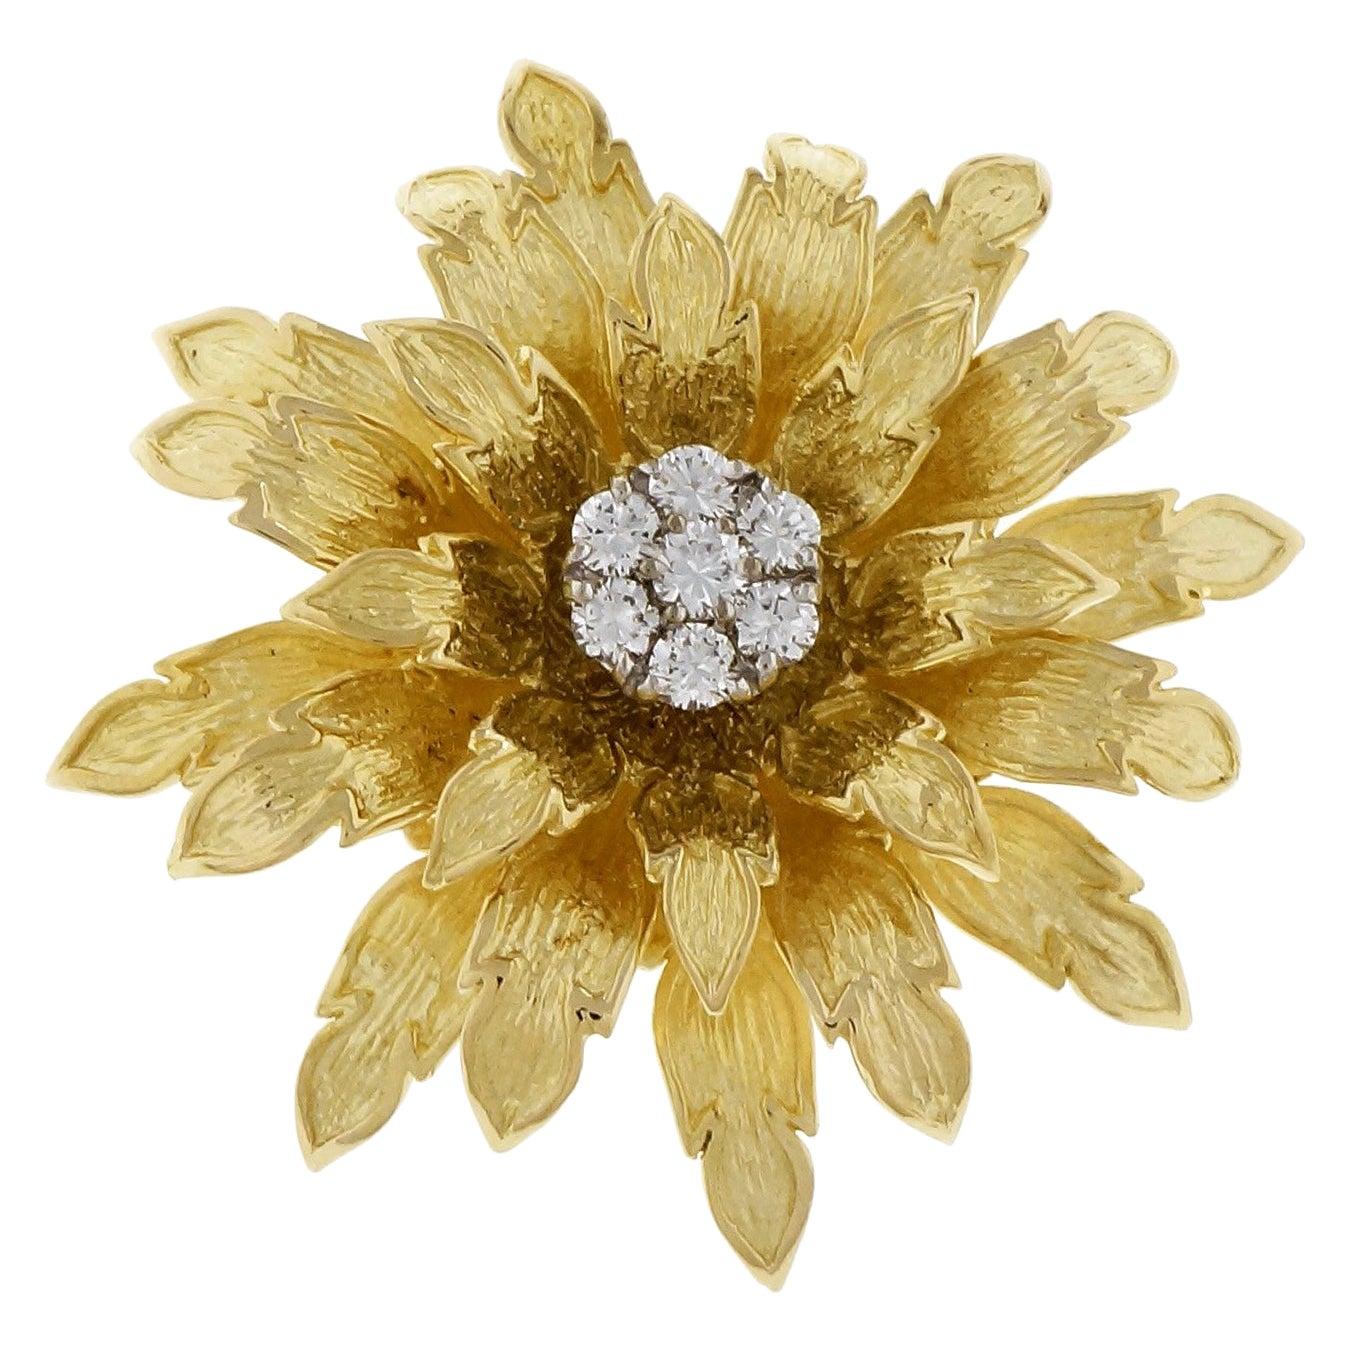 Tiffany & Co. .56 Carat Diamond Textured Gold Flower Brooch